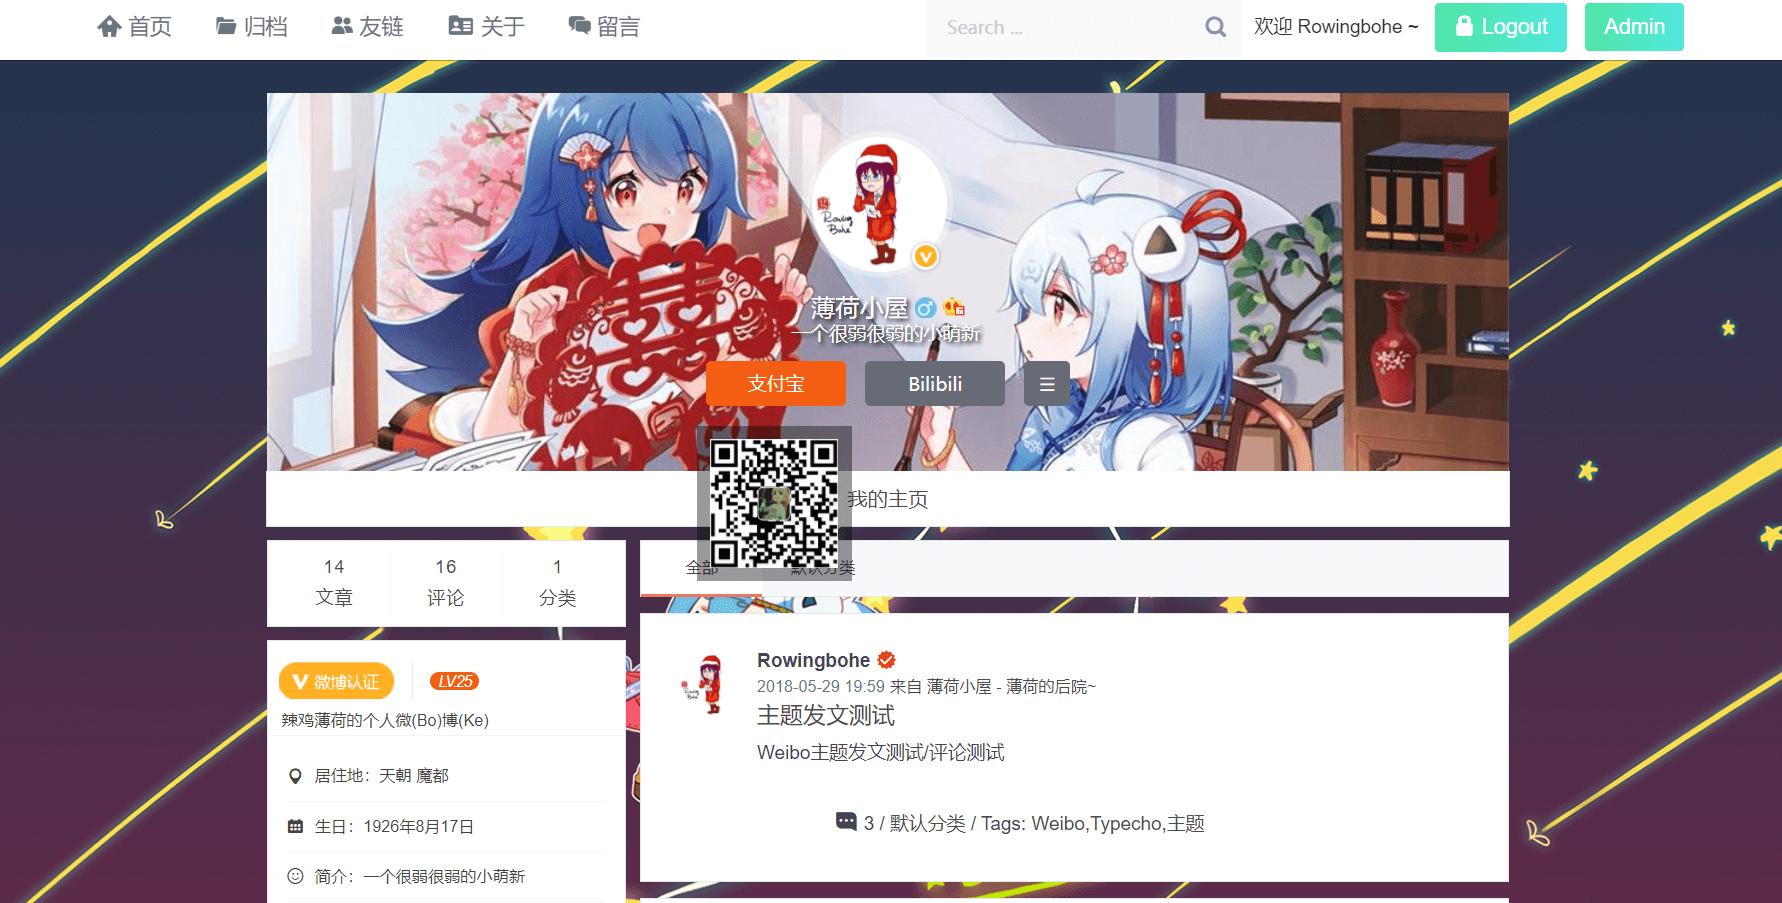 Typecho 仿新浪微博主题 Weibo